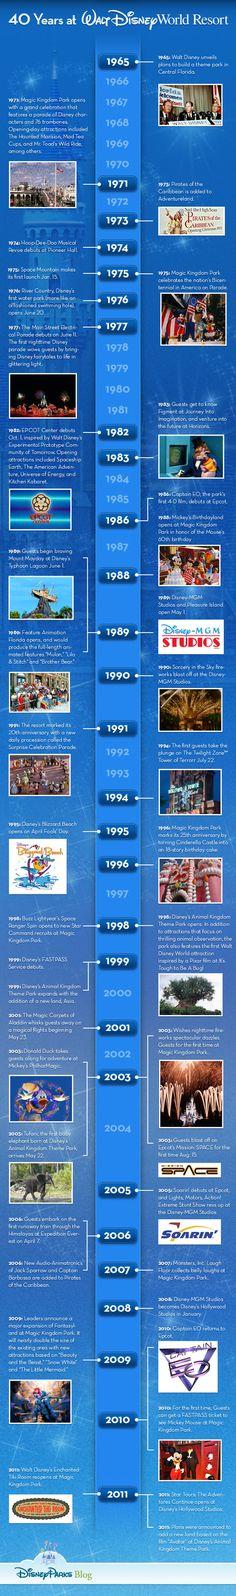 Magic Kingdom Timeline